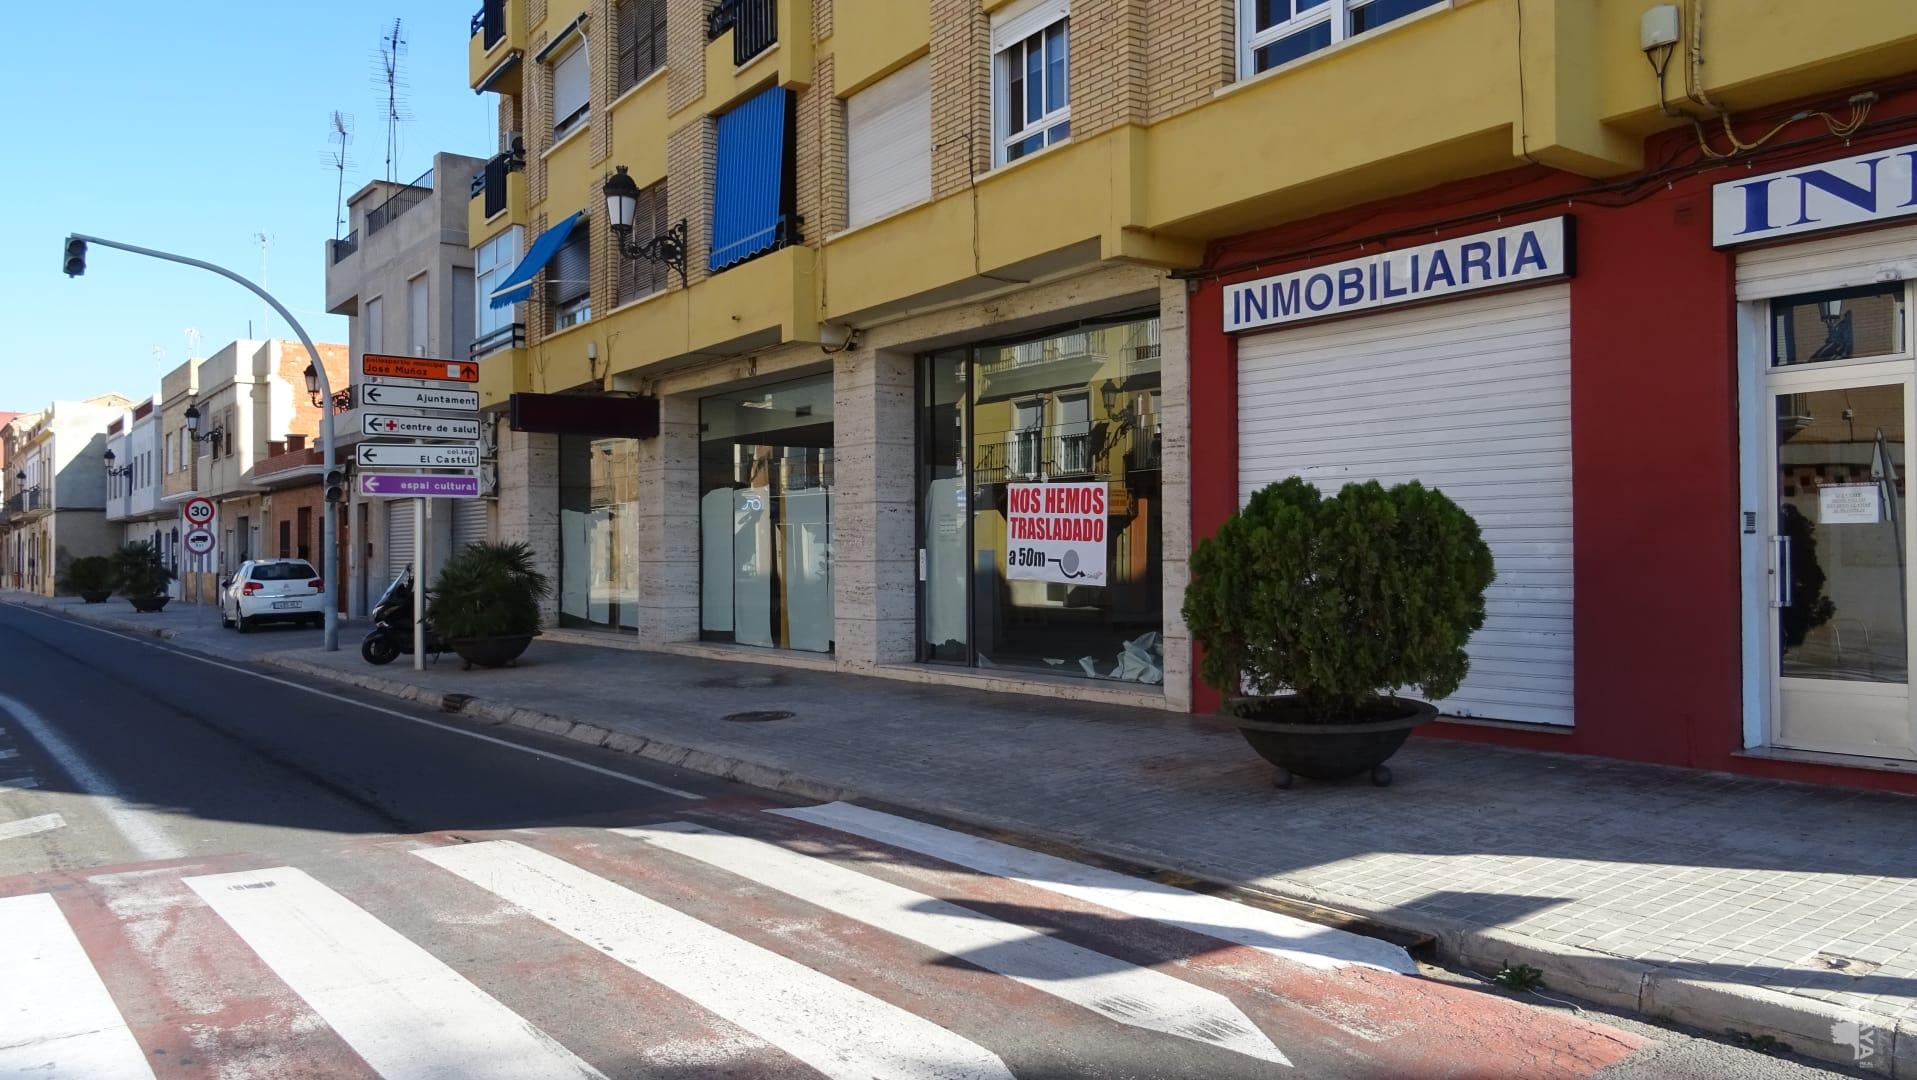 Business premise in Albalat dels Sorells. Local en venta en albalat dels sorells, albalat dels sorells (va